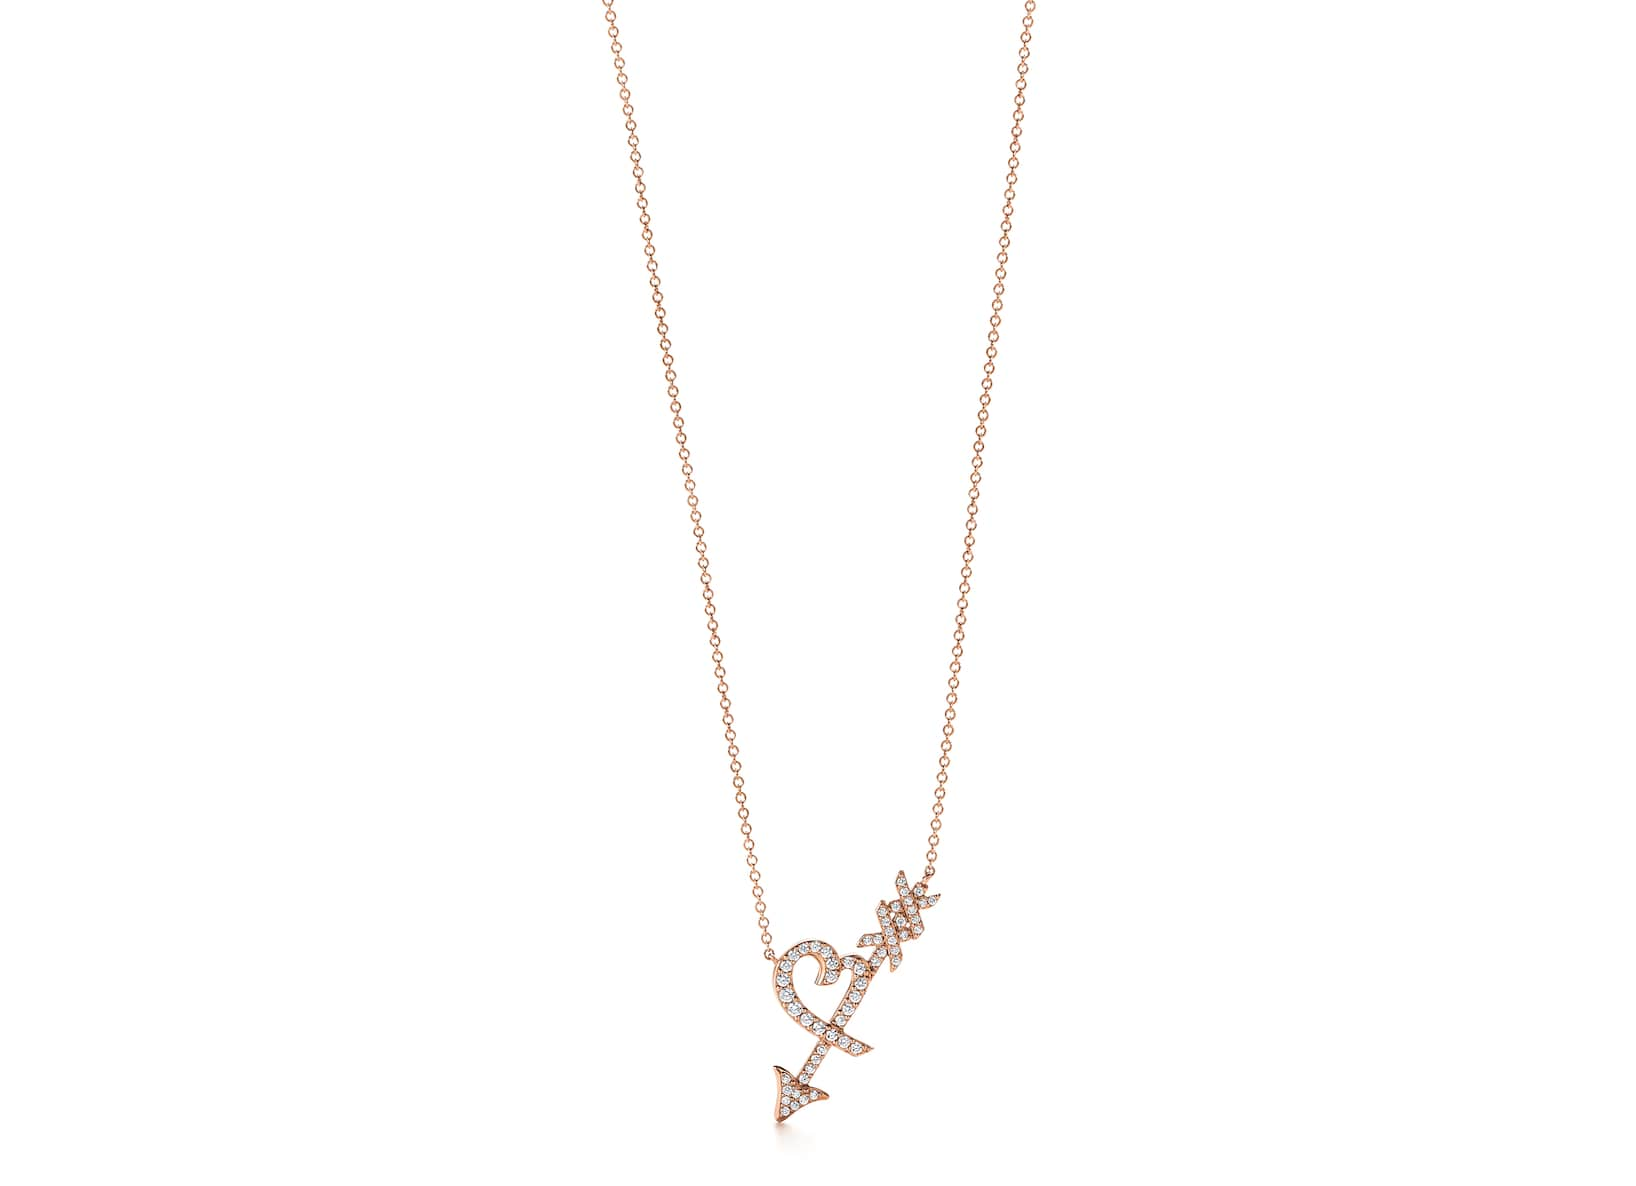 Paloma-Picasso®-Graffiti-Heart-and-Arrow-pendant-diamonds-in-18k-rose-gold